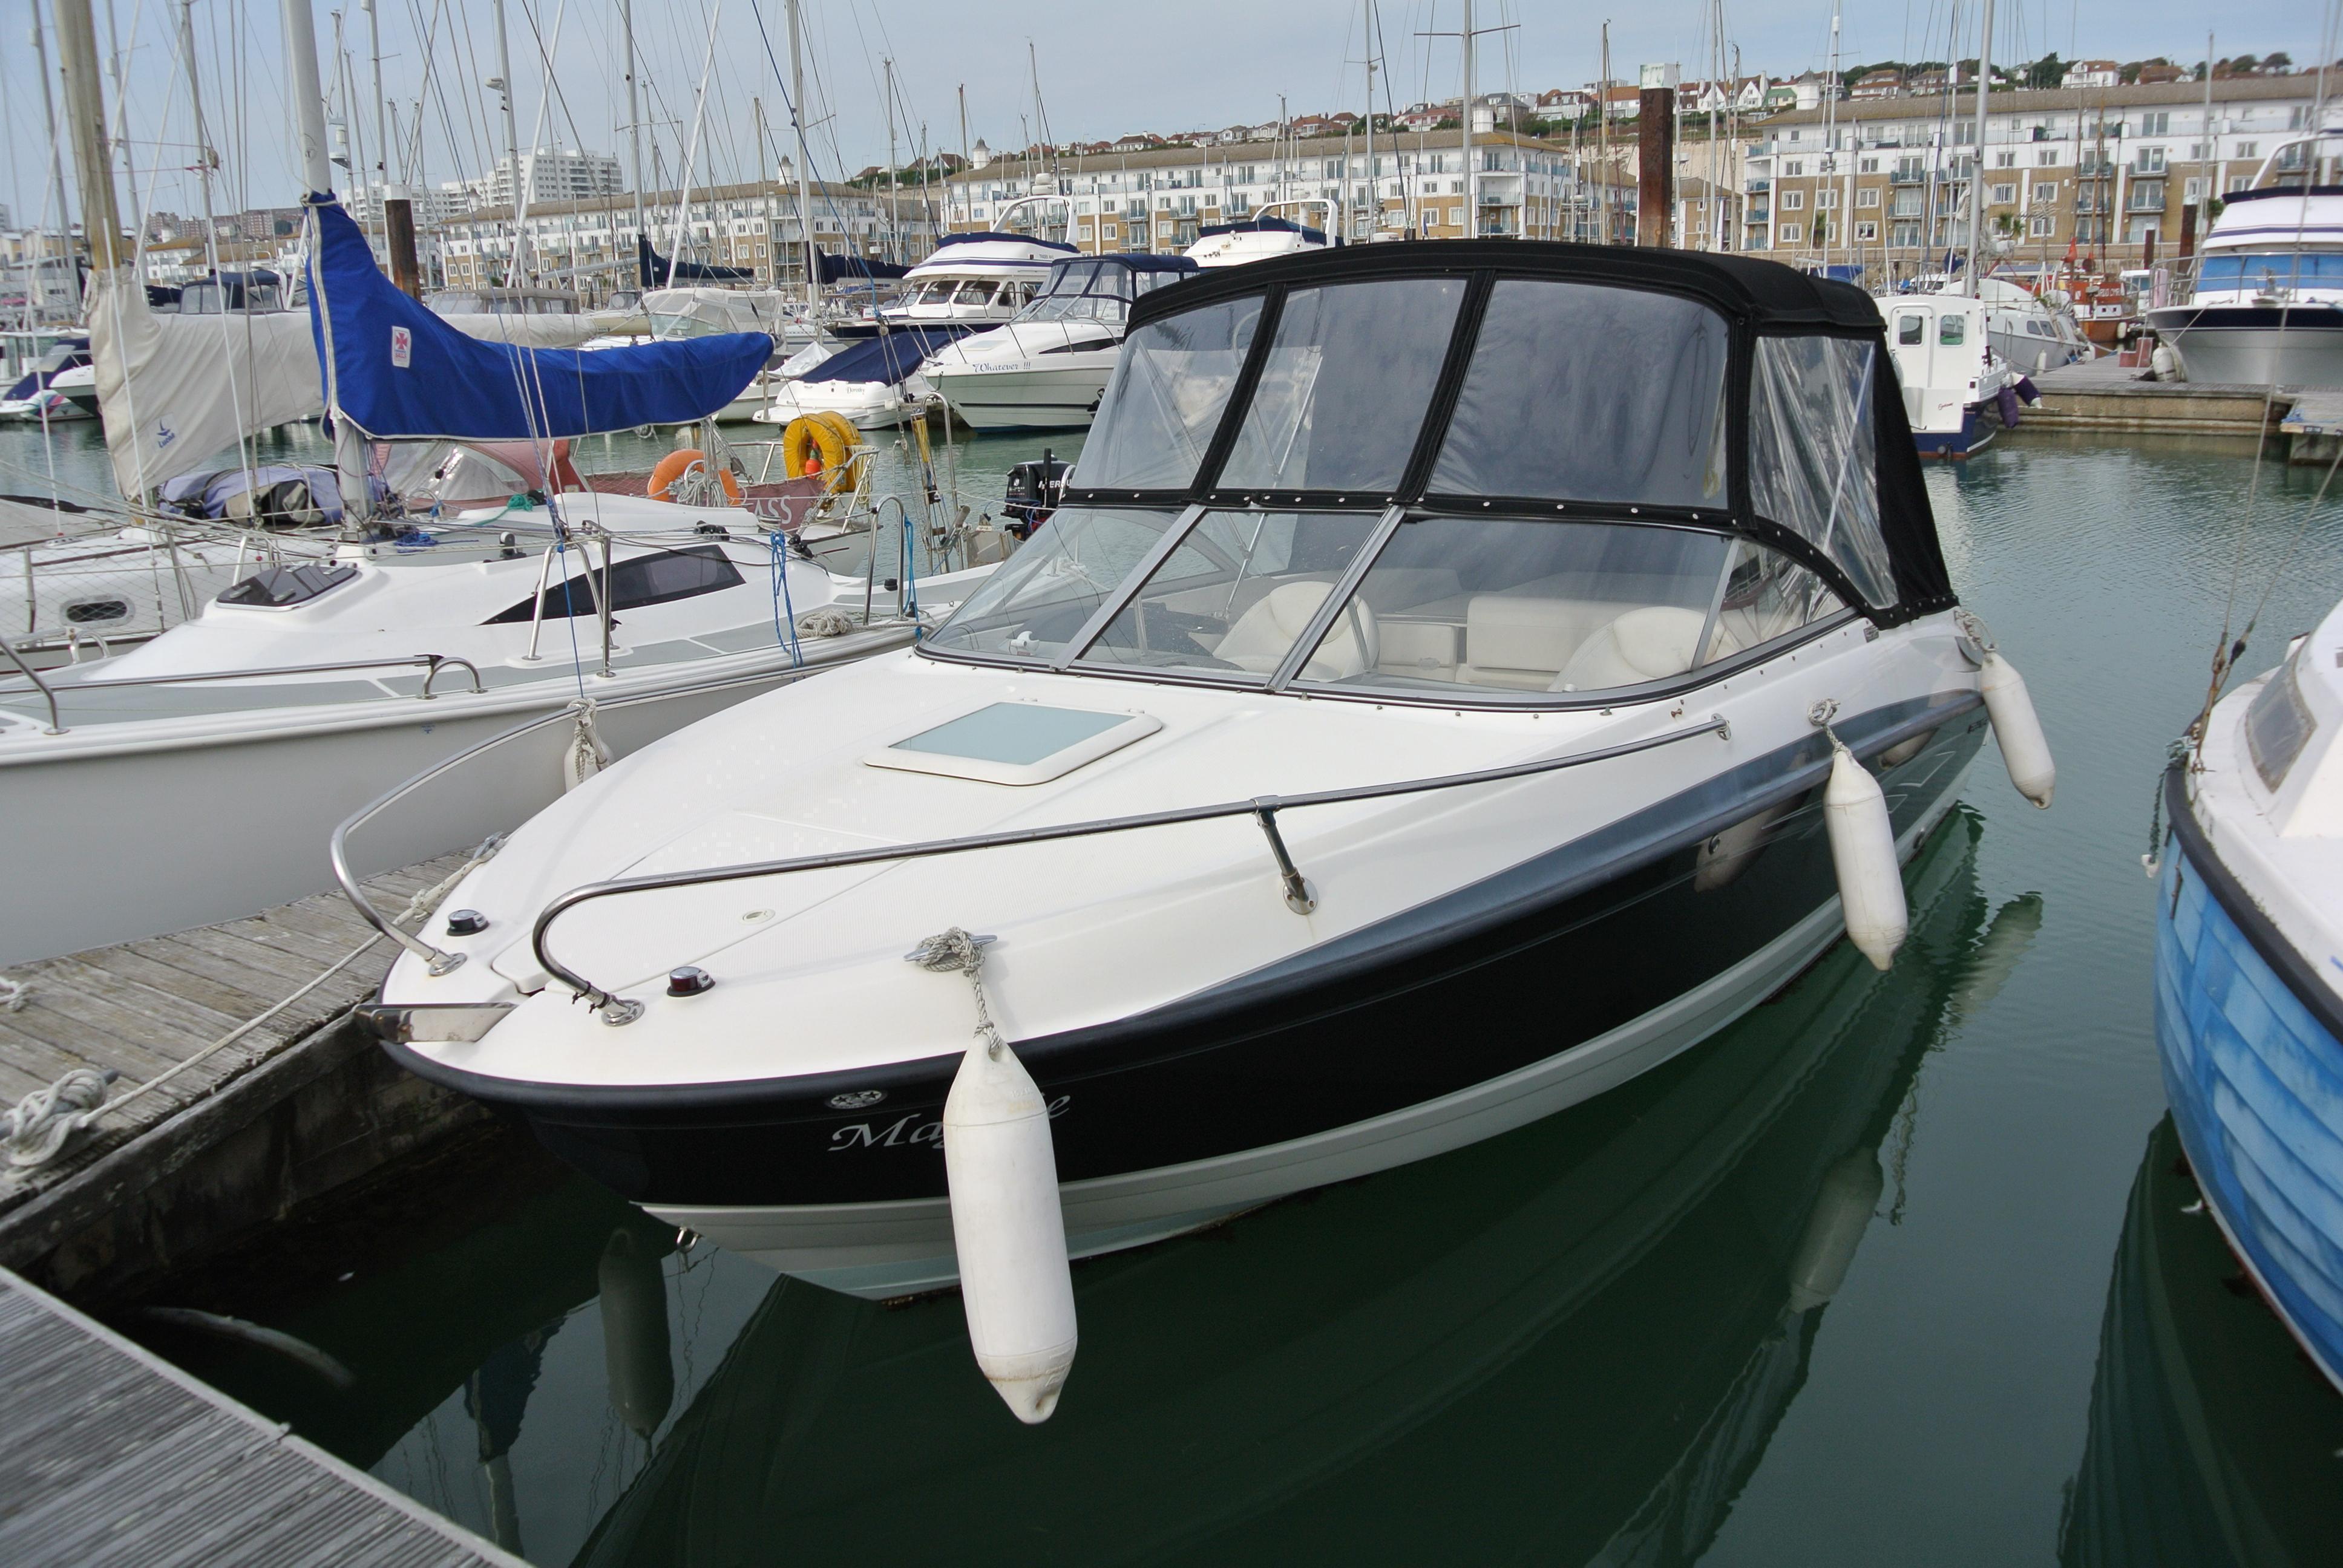 Bayliner 652 Cuddy - Brick7 Boats